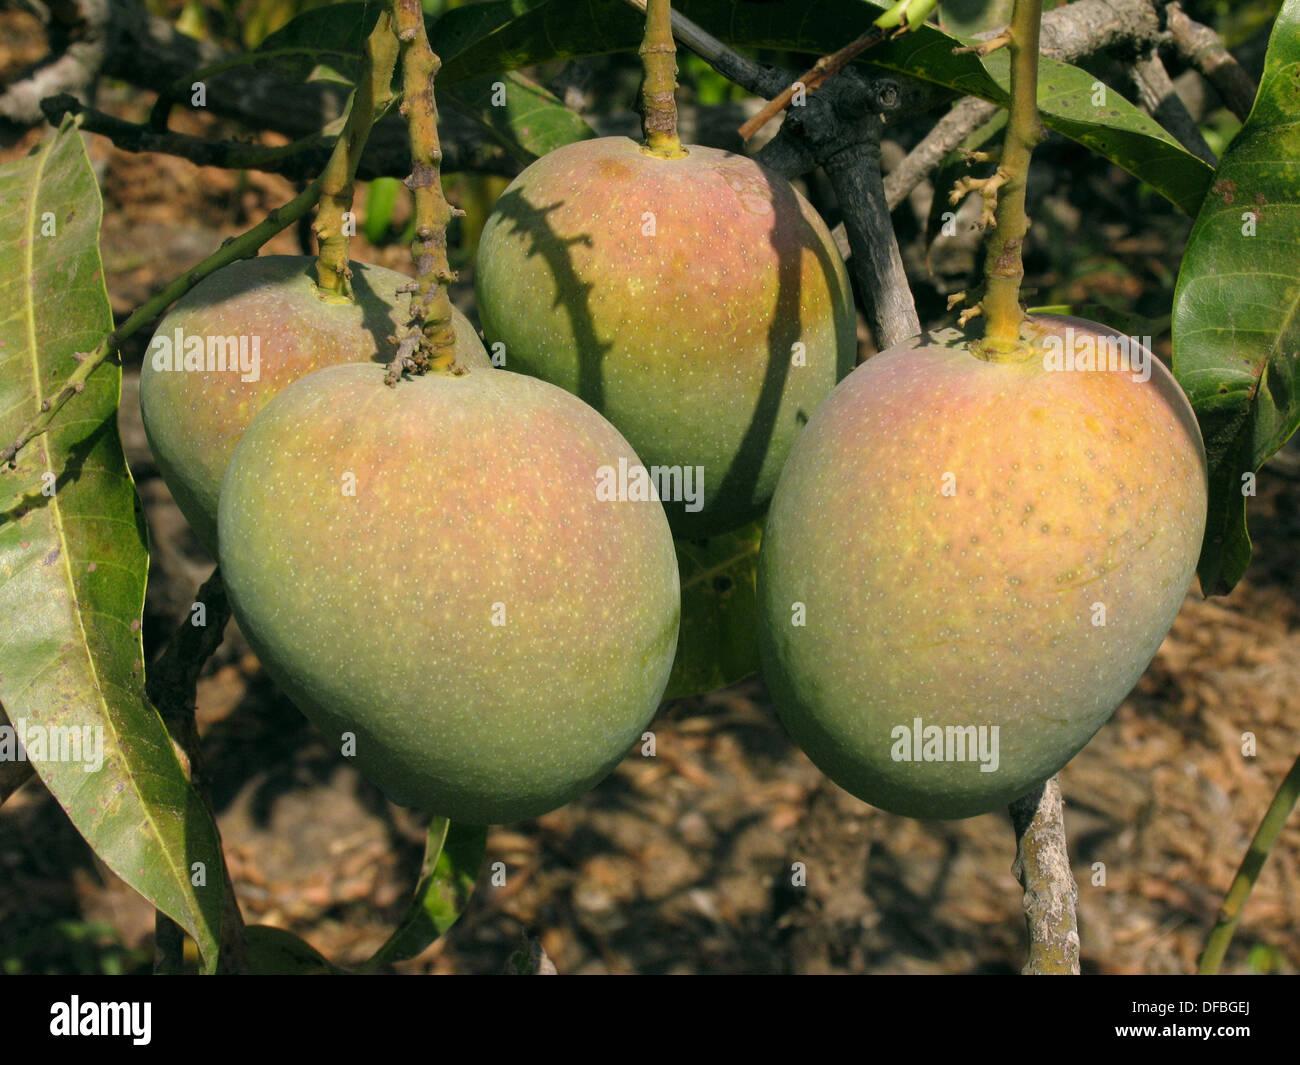 alphonso mangoes hanging on a tree mangifera indica l anacardiaceae DFBGEJ